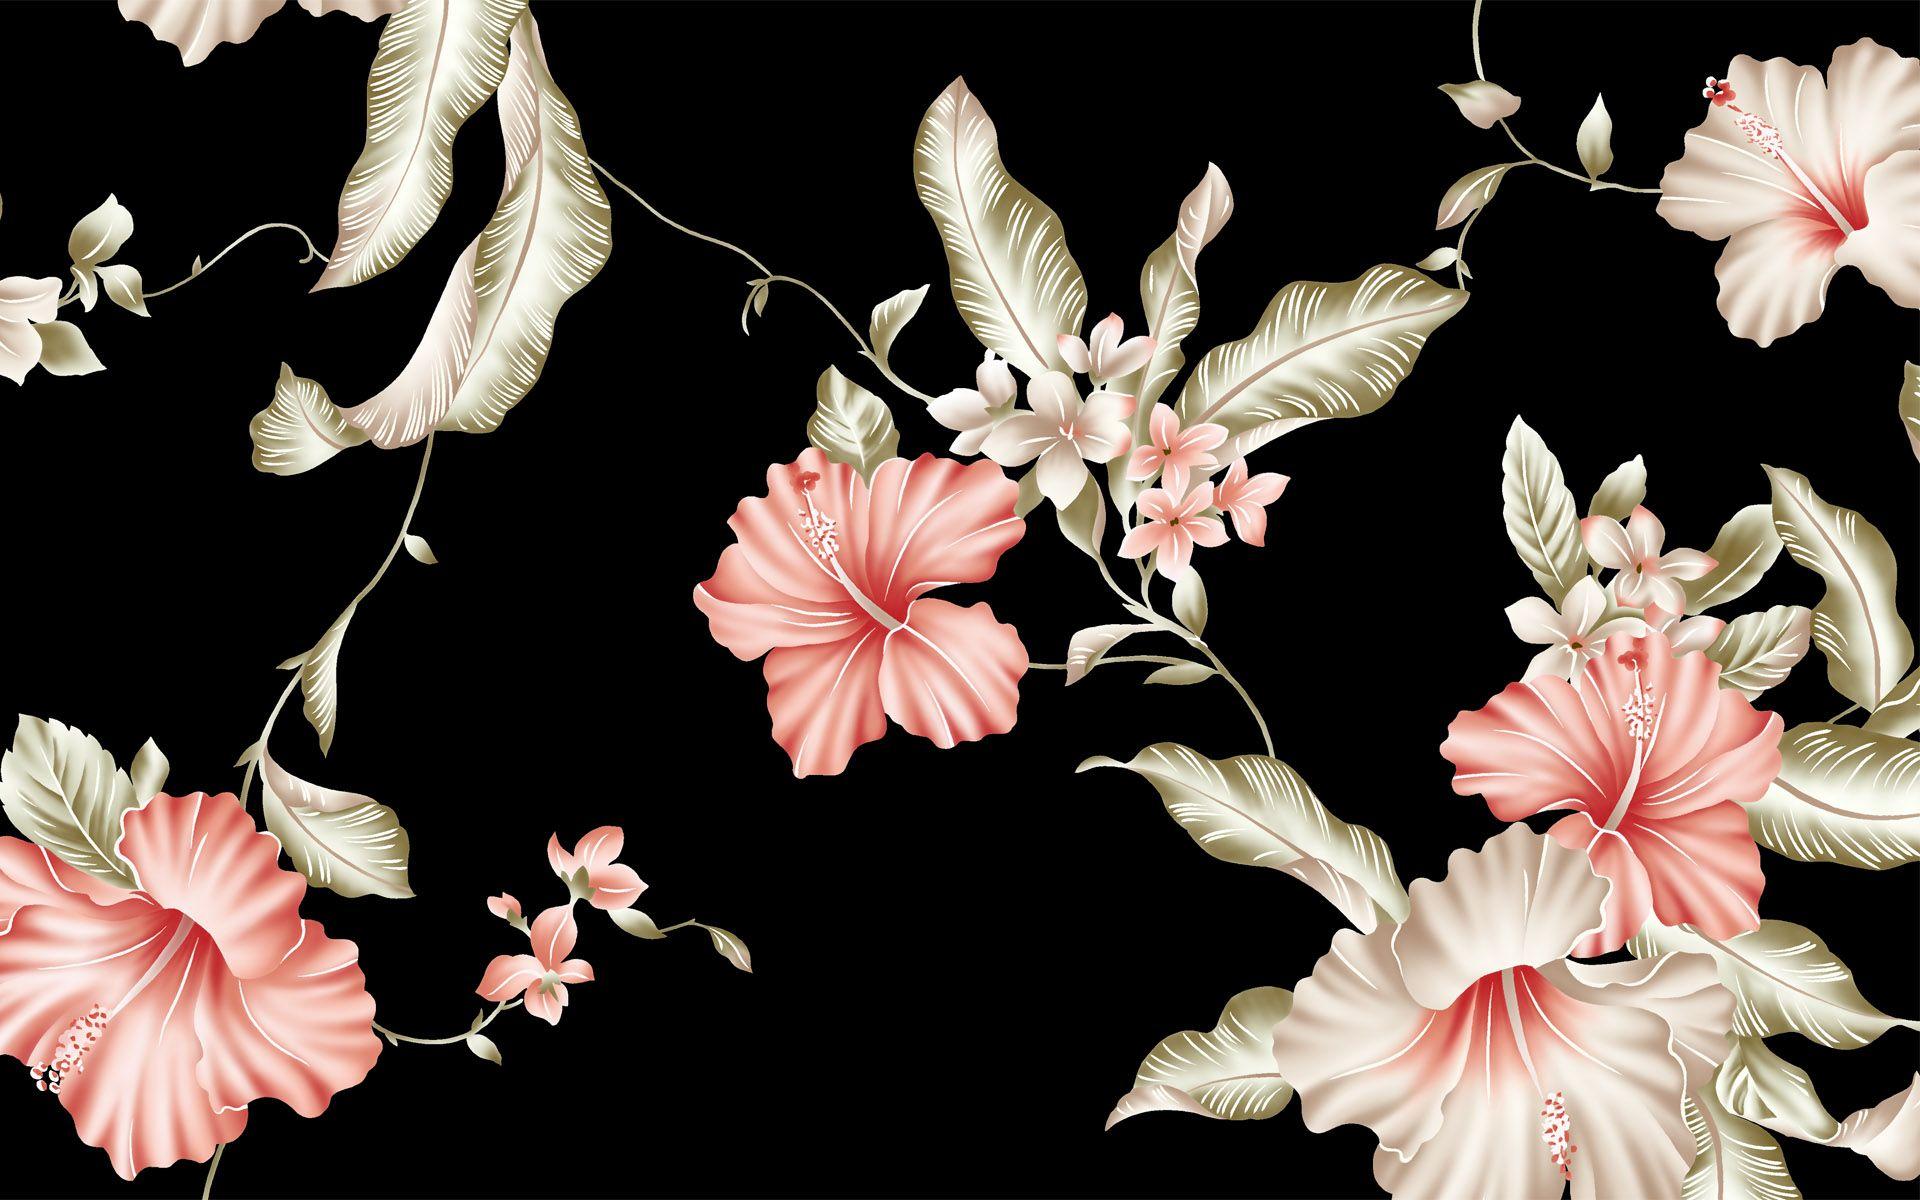 pink flower pattern wallpaper for desktop